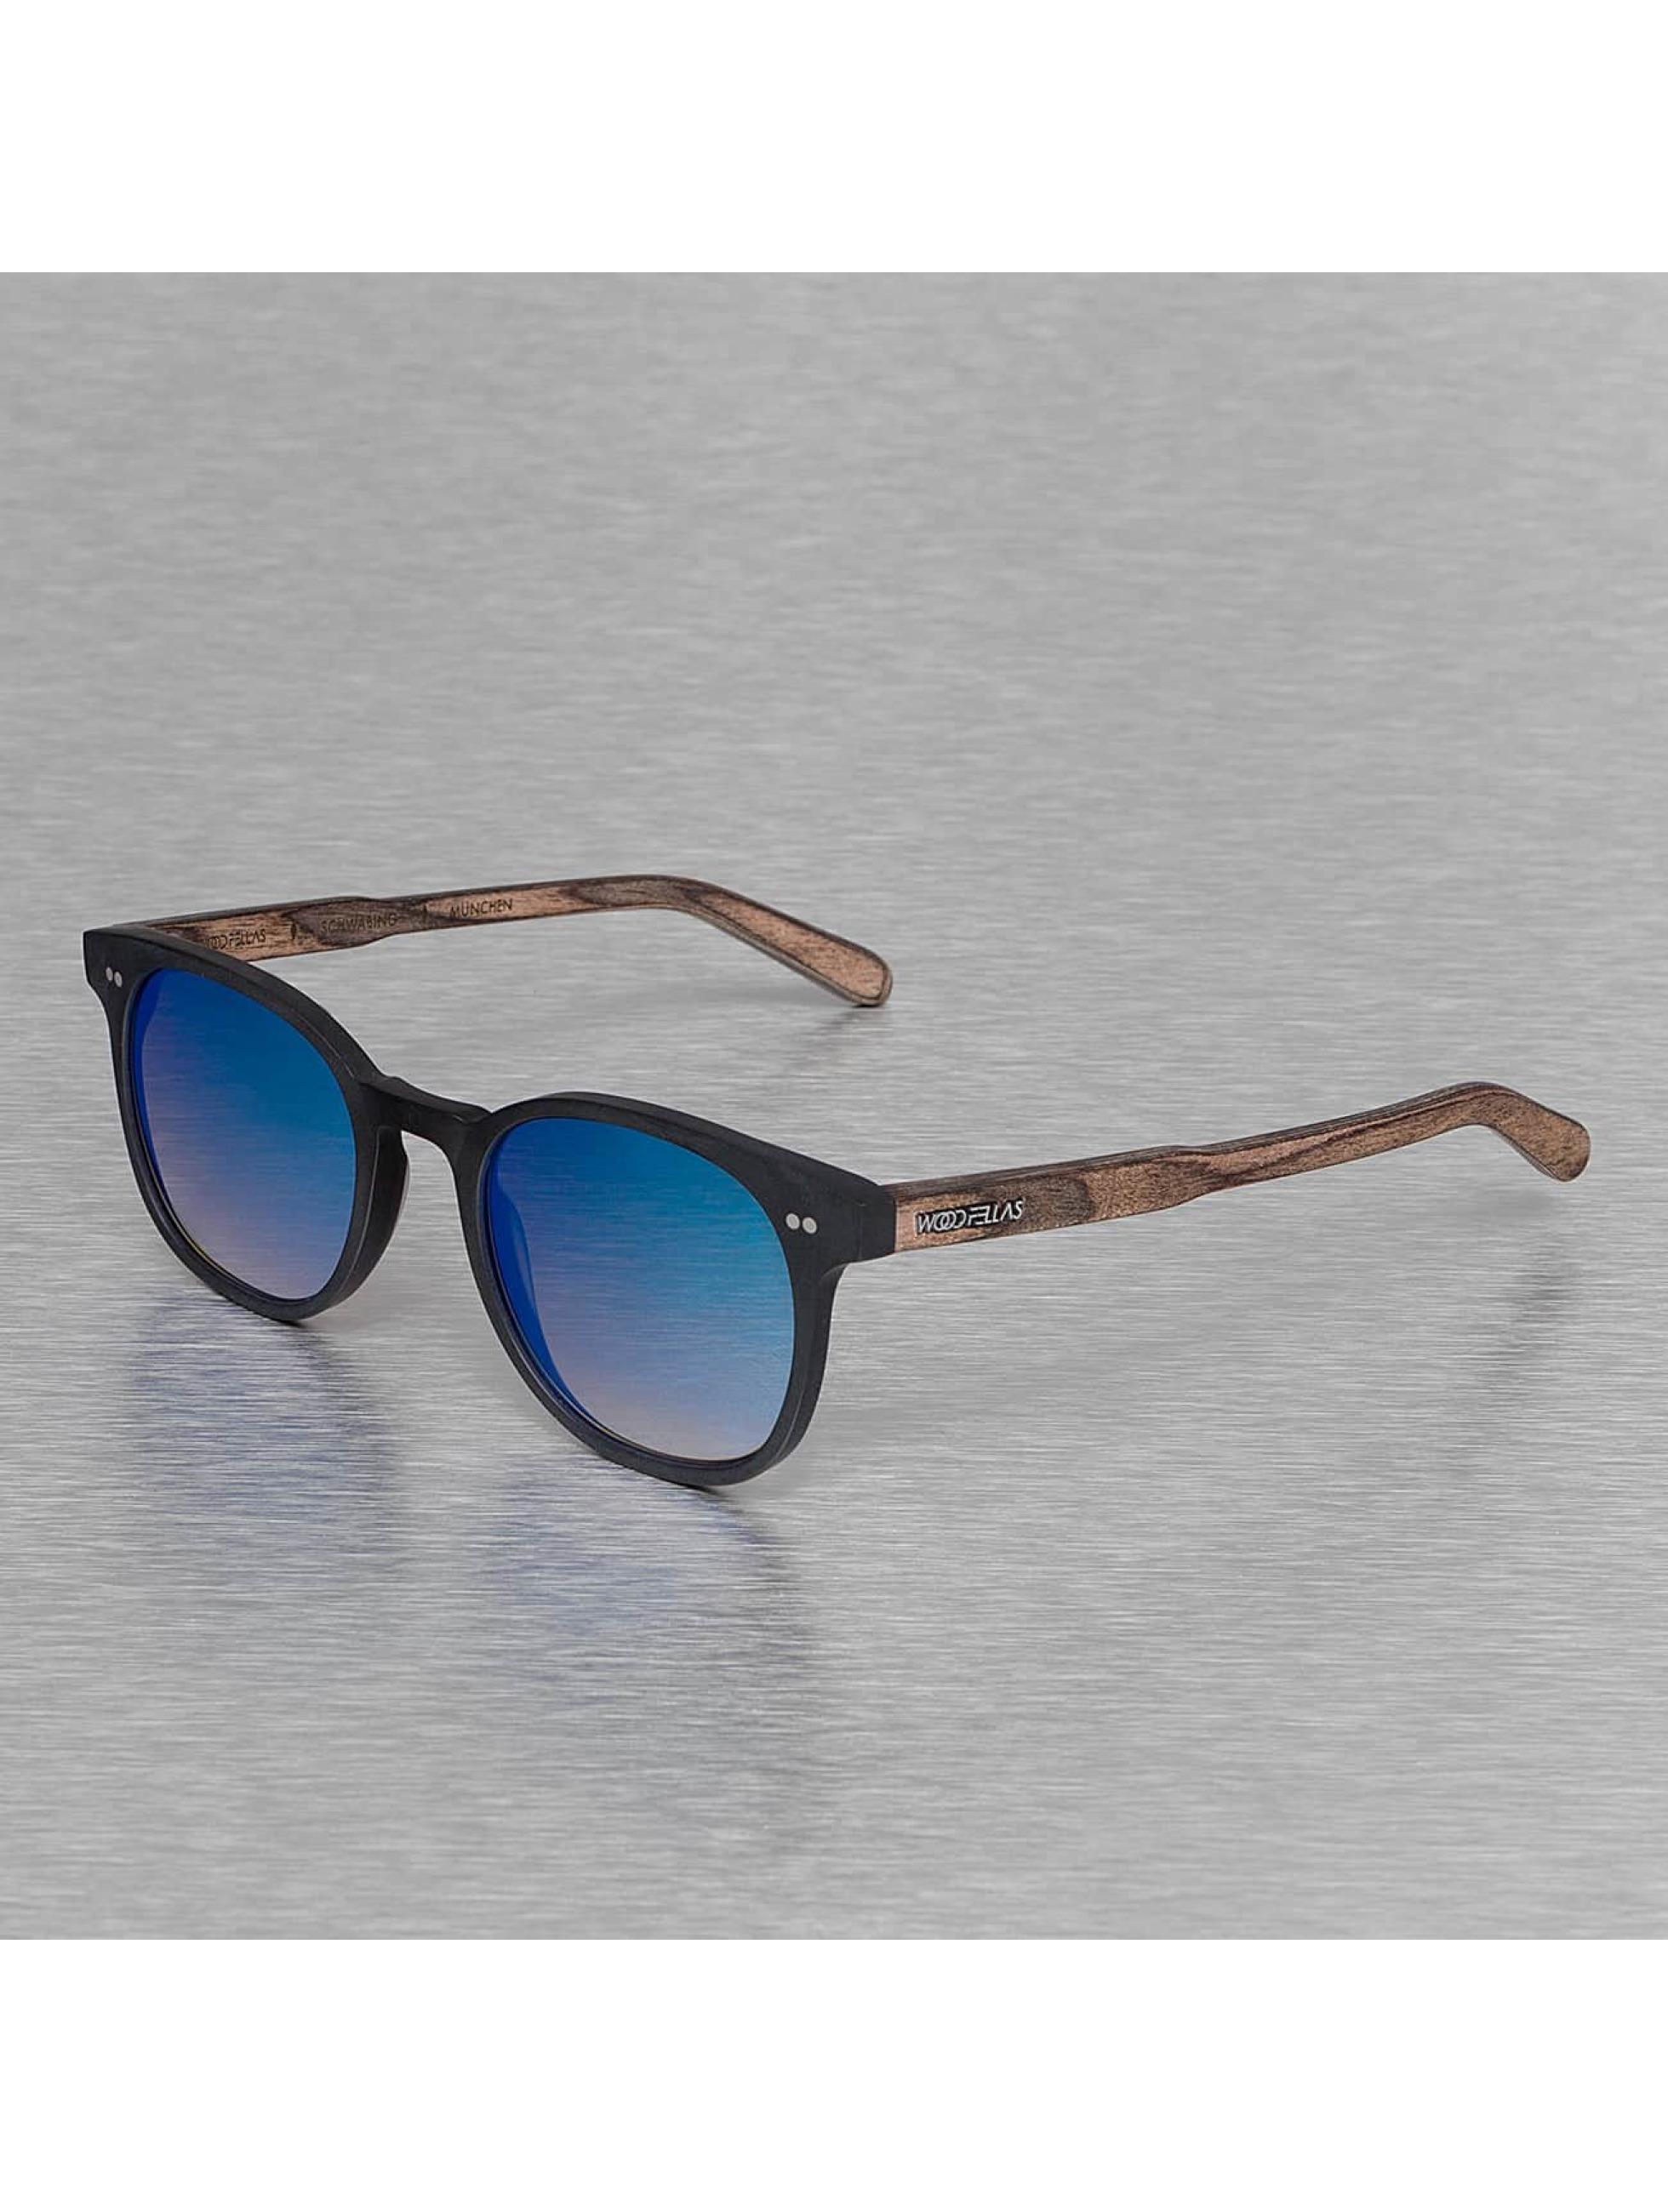 Wood Fellas Eyewear Sonnenbrille Eyewear Schwabing Polarized Mirror schwarz